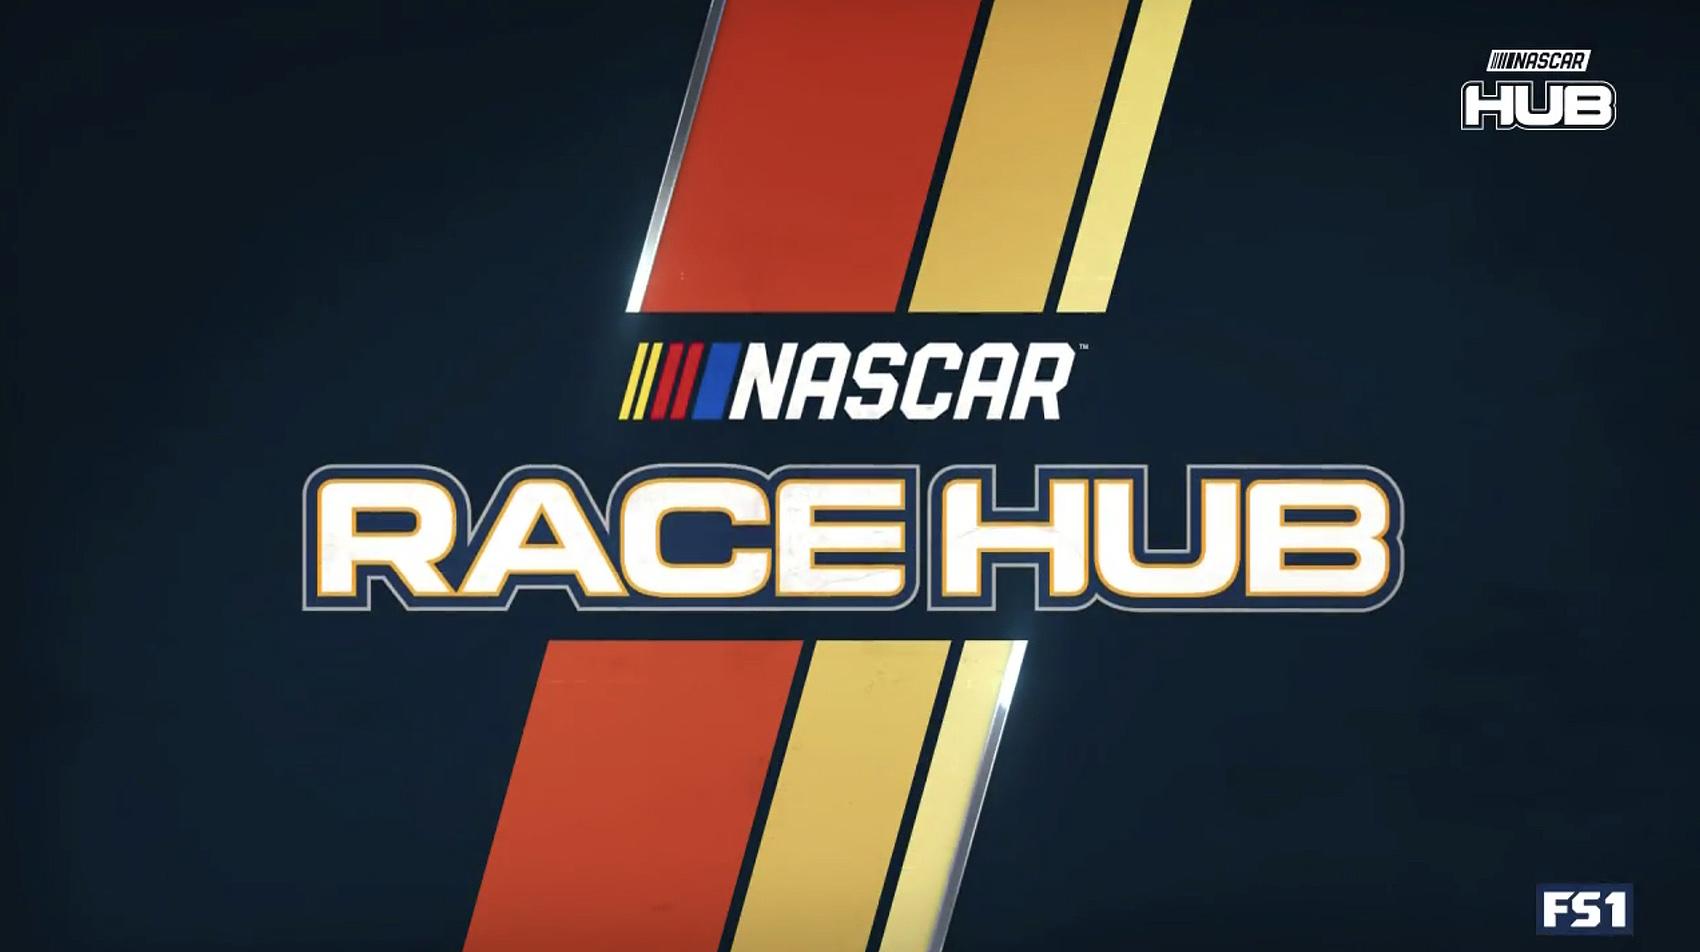 NCS_NASCAR-Fox-2019-Broadcast-Design_016